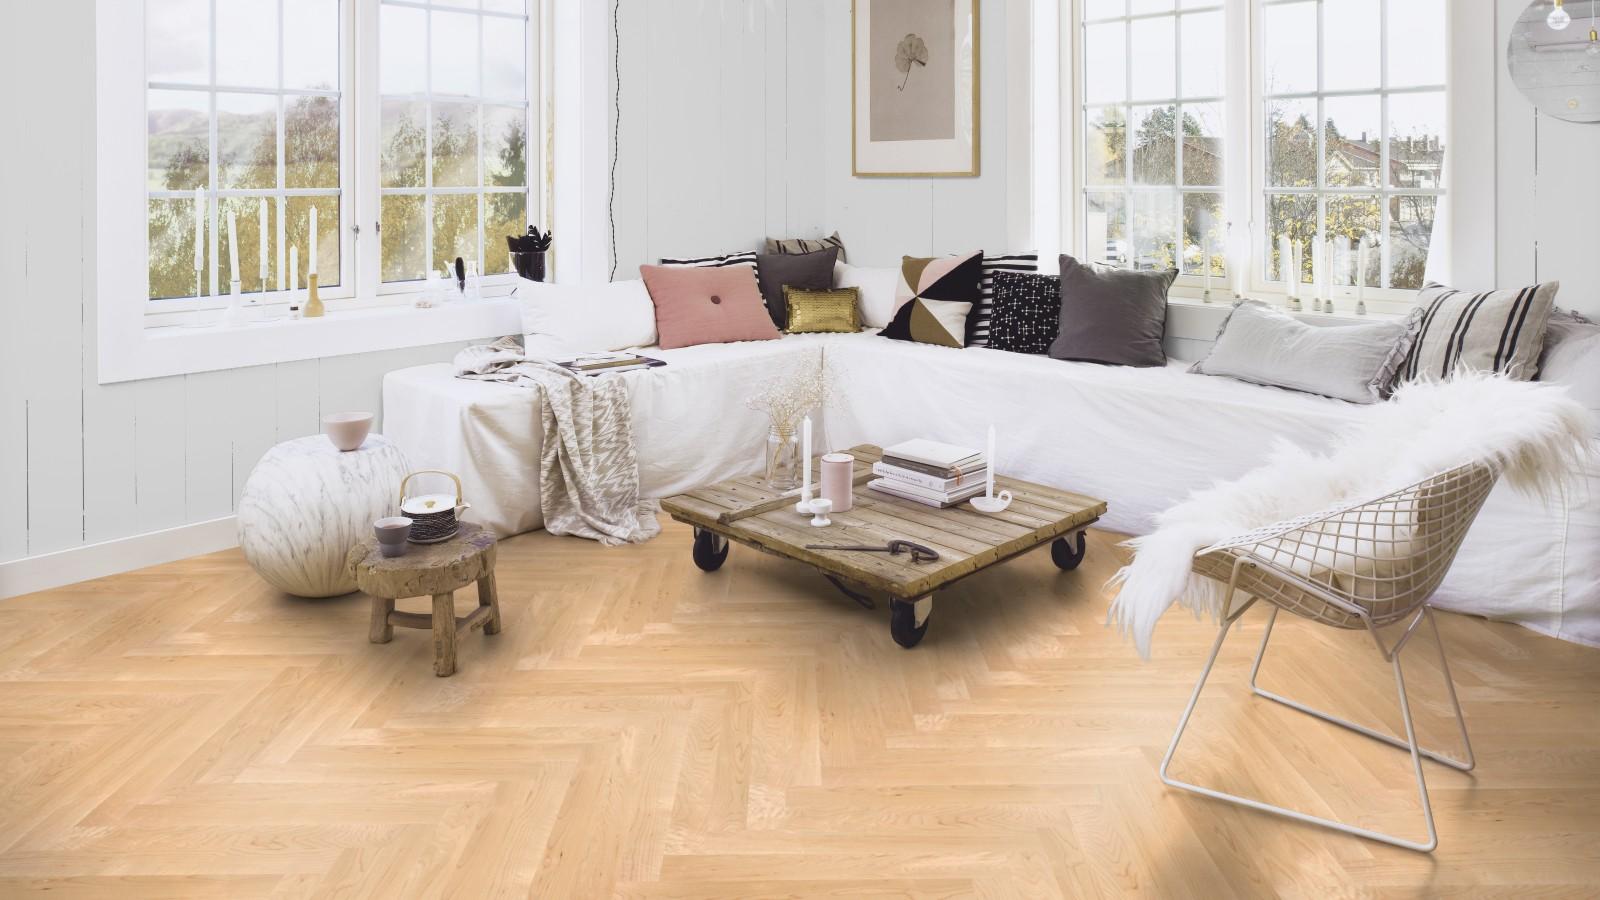 parkett 10 mm aufbauh he. Black Bedroom Furniture Sets. Home Design Ideas